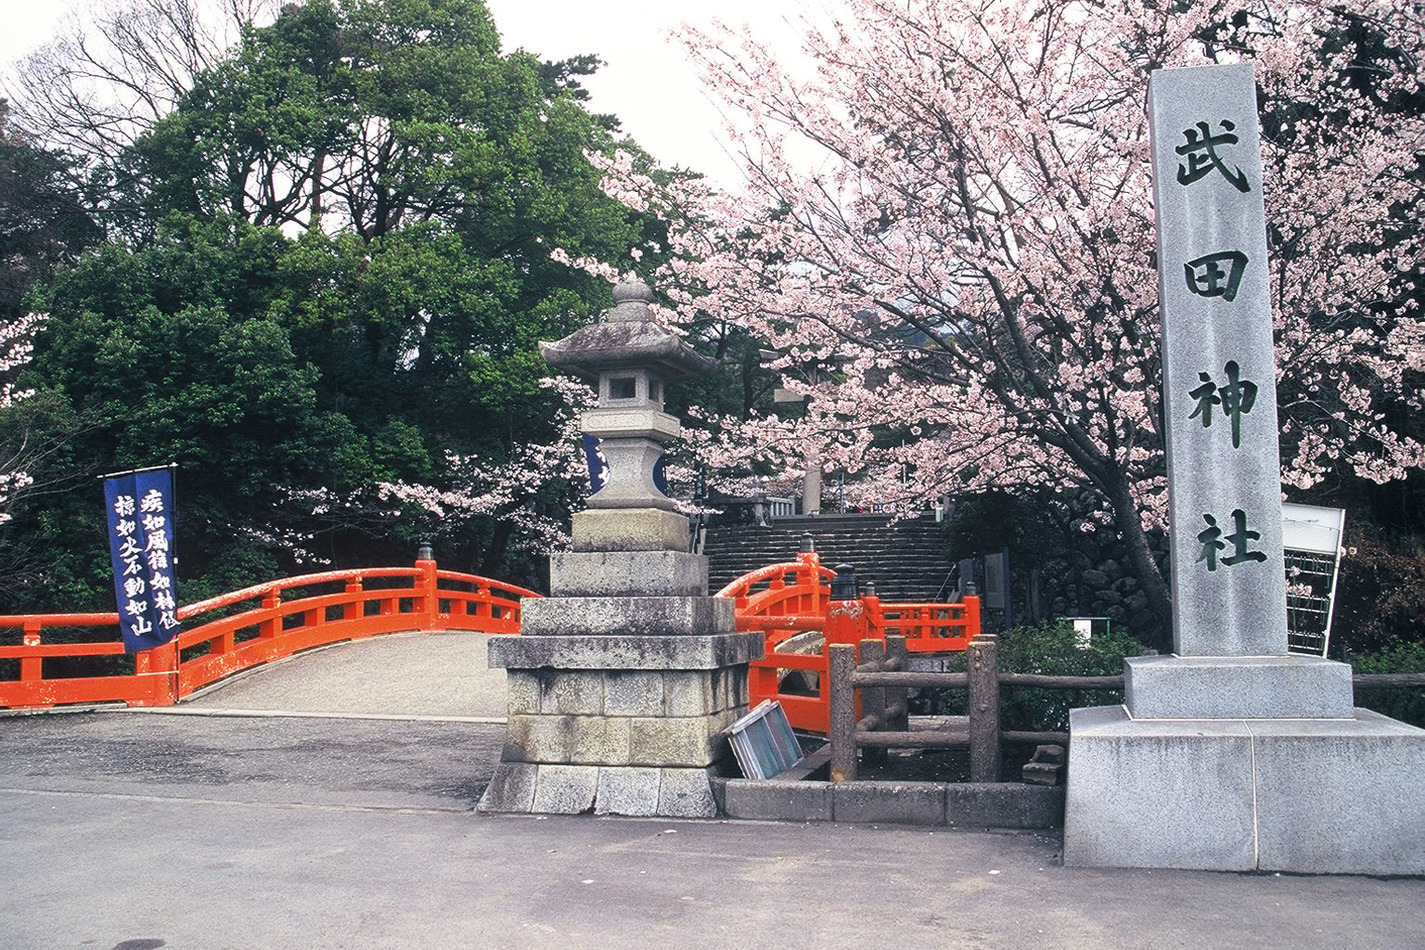 Takeda-jinja Shrine